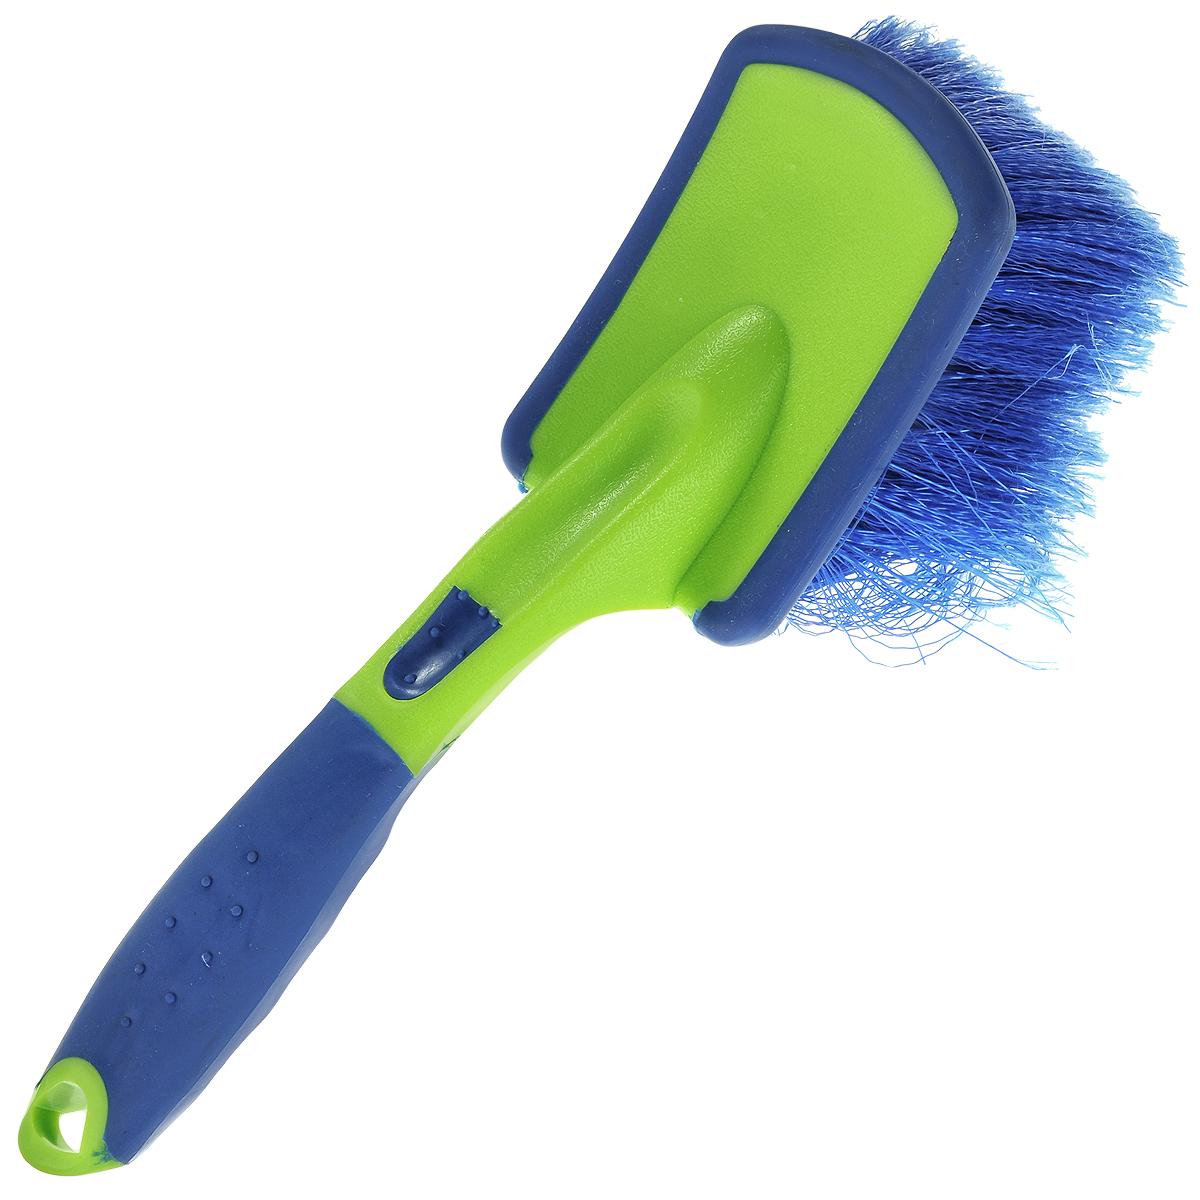 Щетка для мытья автомобиля Sapfire, цвет: синий, салатовый, 24,5 см щетка для мытья автомобиля stels 55223